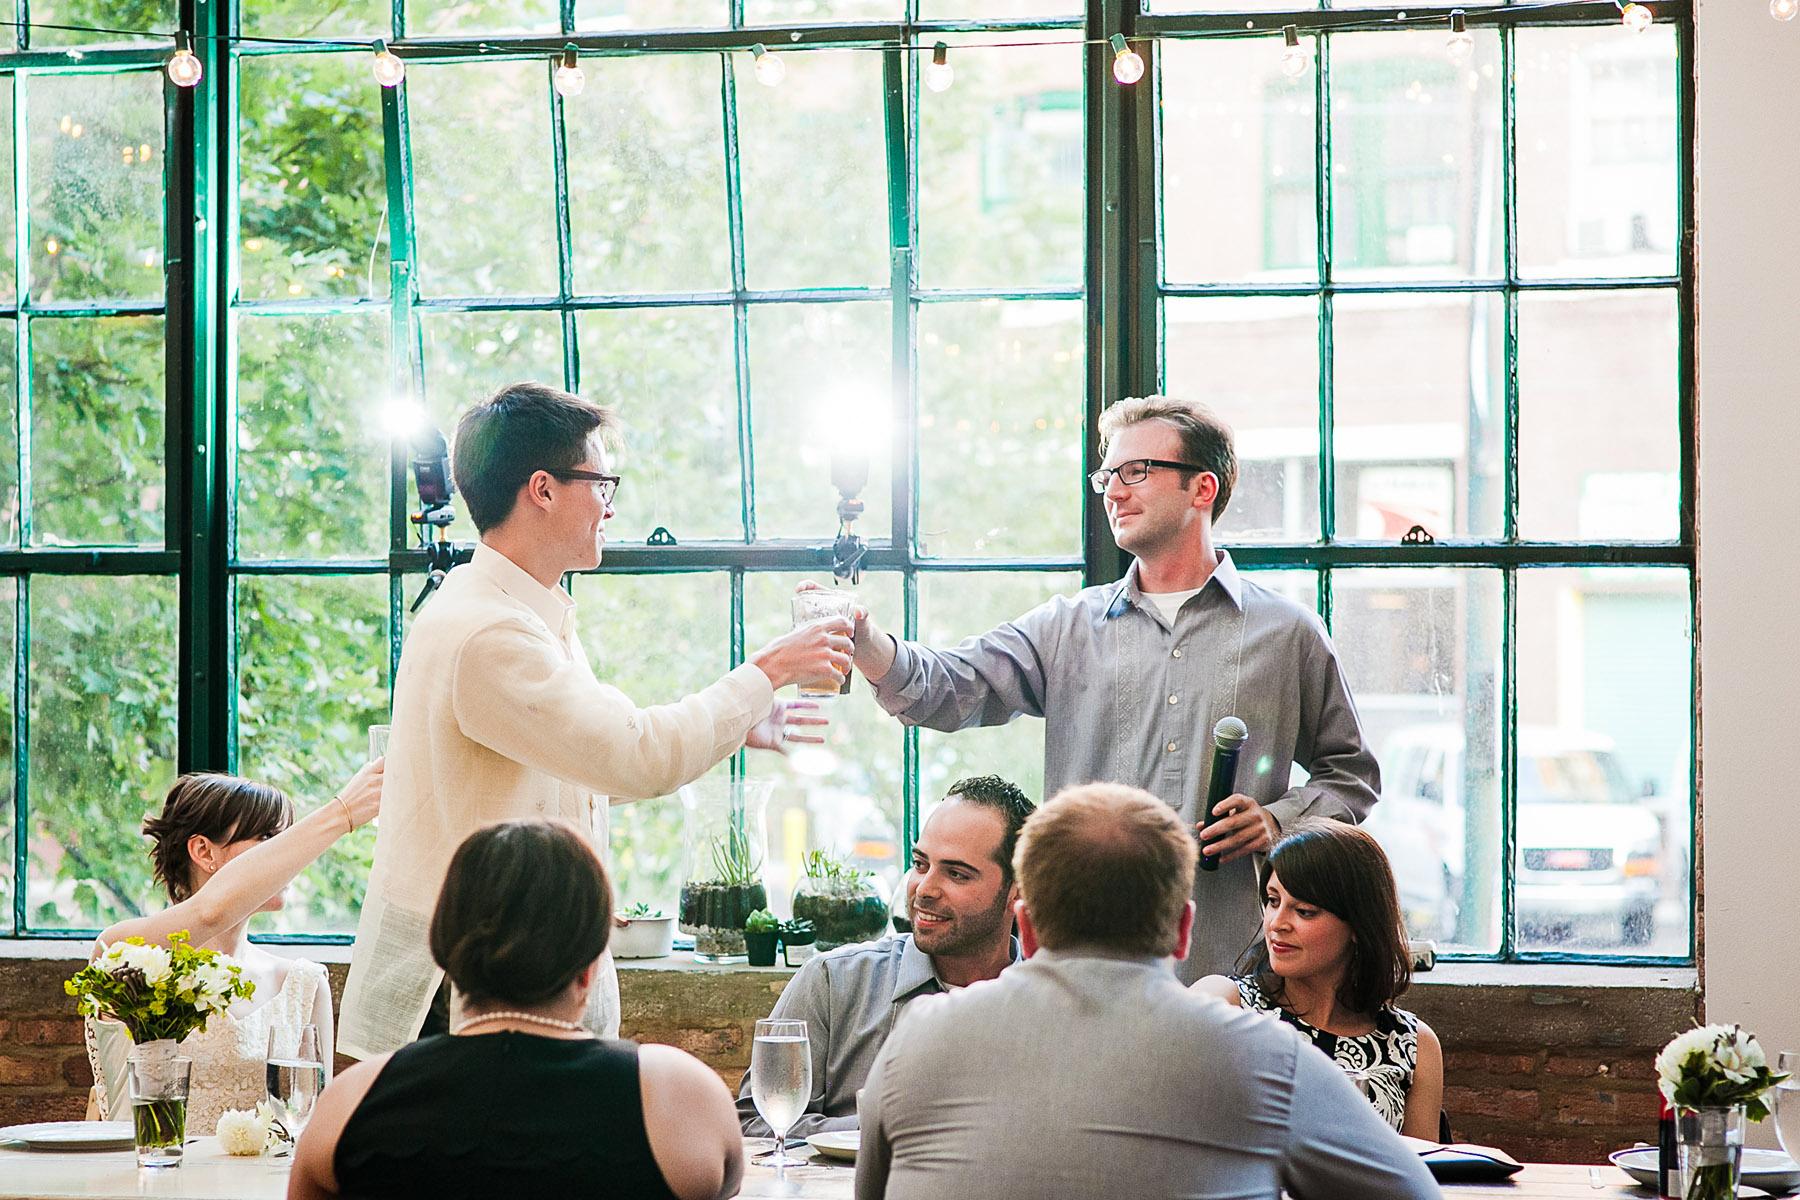 st-hegwig-chicago-urban-arts-society-terrarium-inspired-wedding-documentary-wedding-photography-oriana-koren-61.jpg